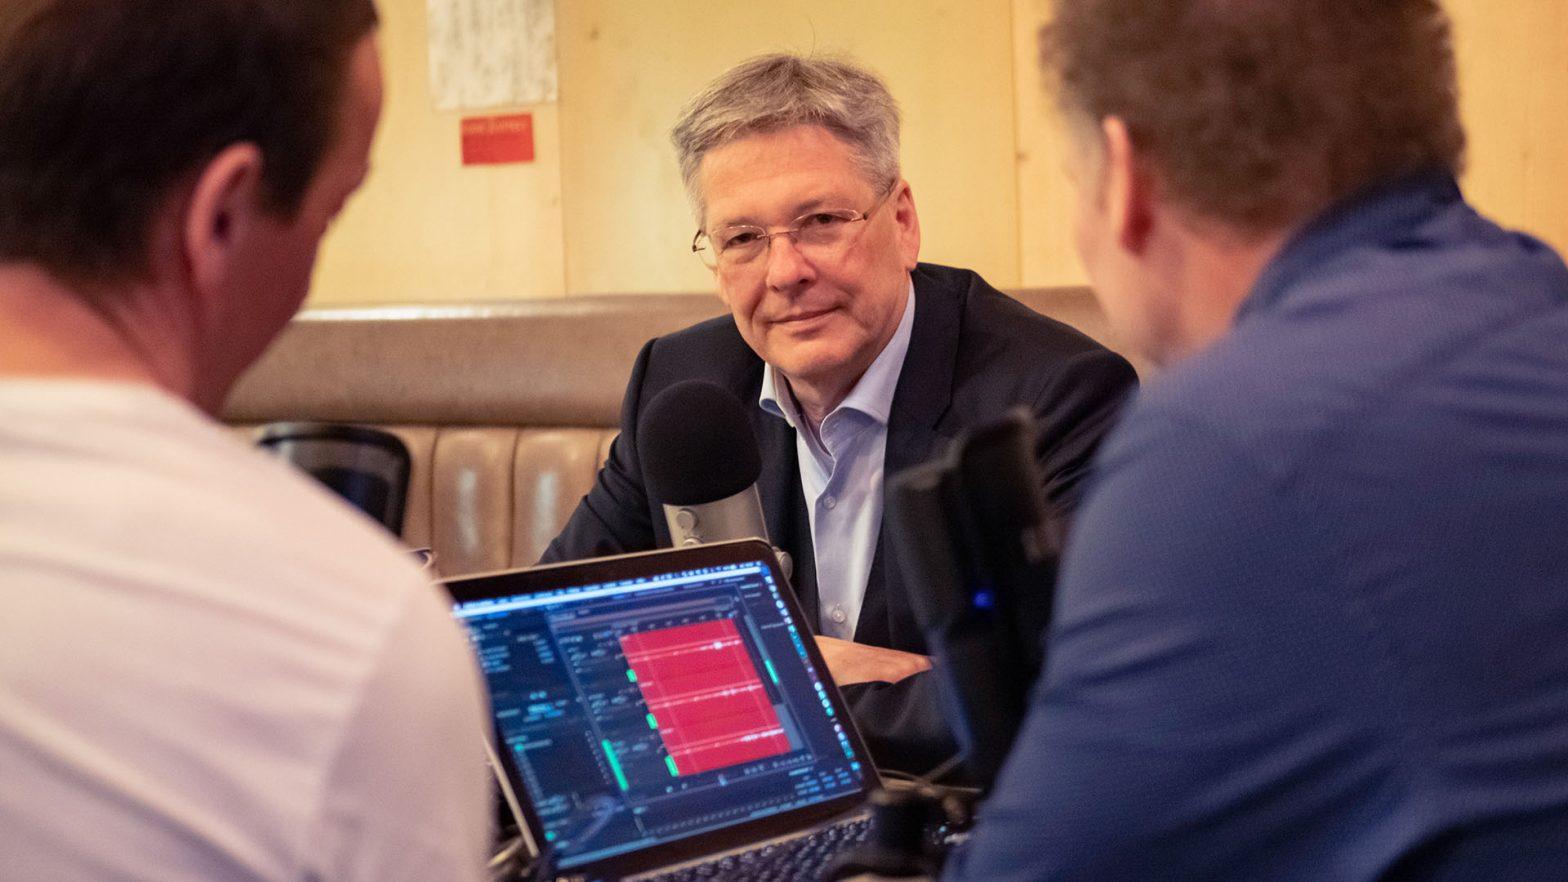 Landeshauptmann Peter Kaiser von Kärnten, SPÖ